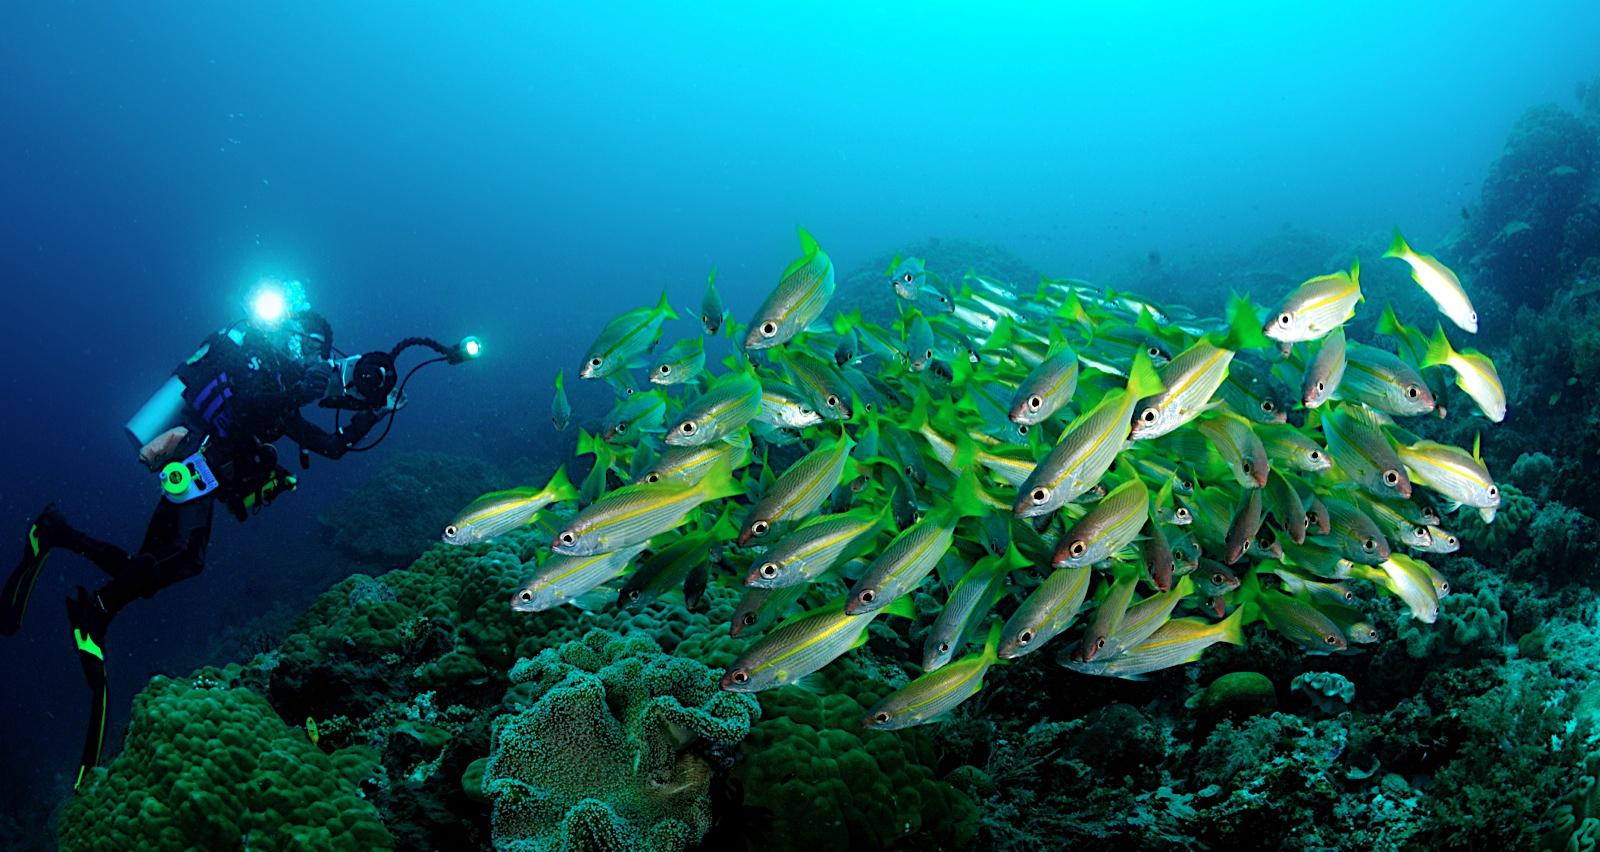 Kawasan perairan Raja Ampat menjadi favorit para penyelam dan peneliti di seluruh dunia